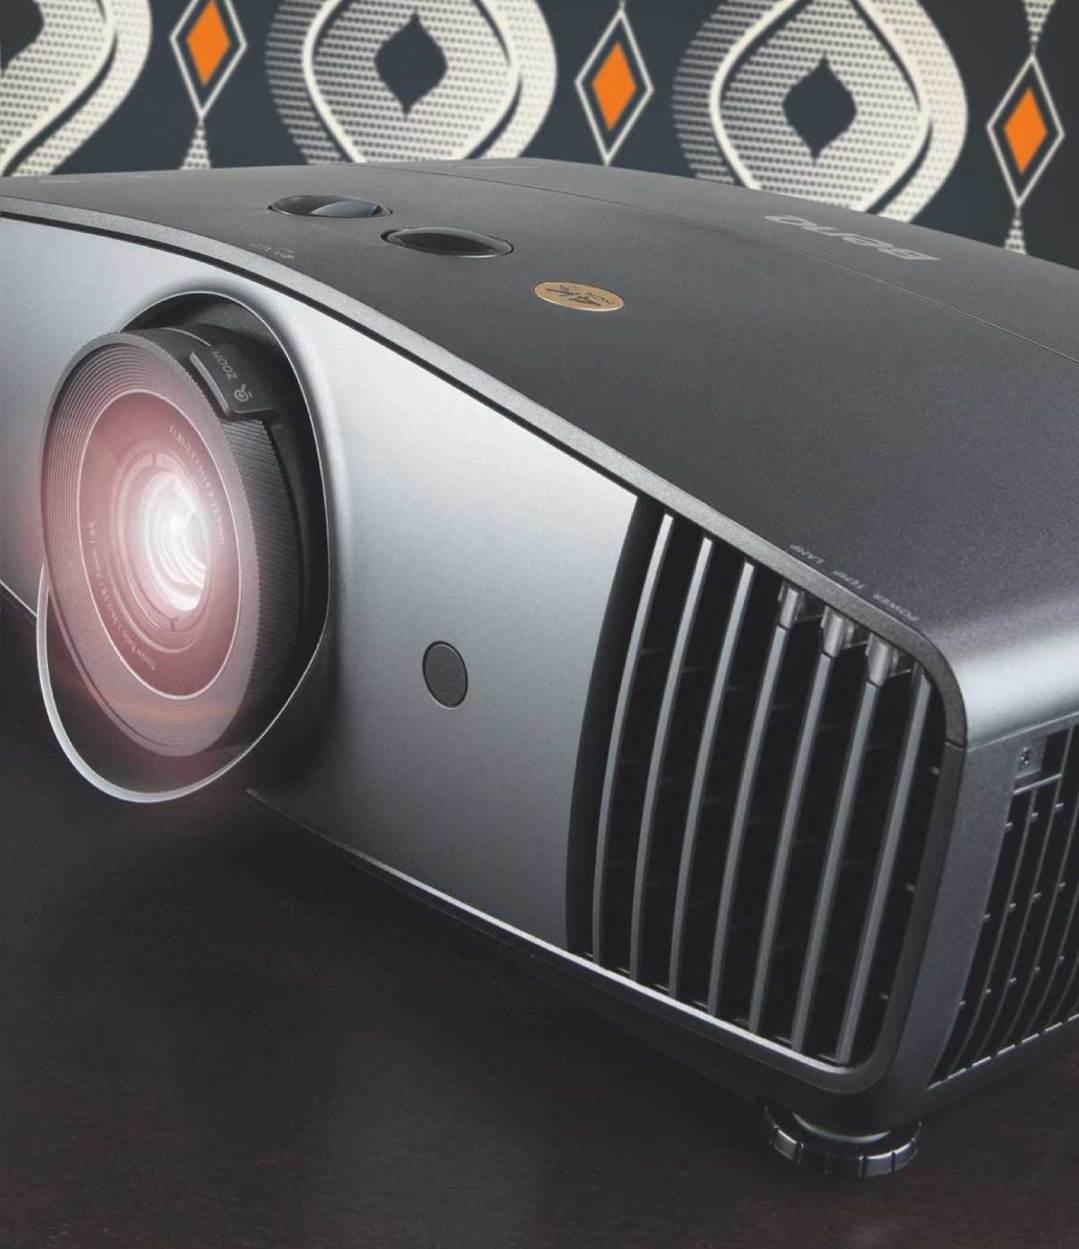 Benq W5700 Review Dlp Reaches Its 4k Prime 7review